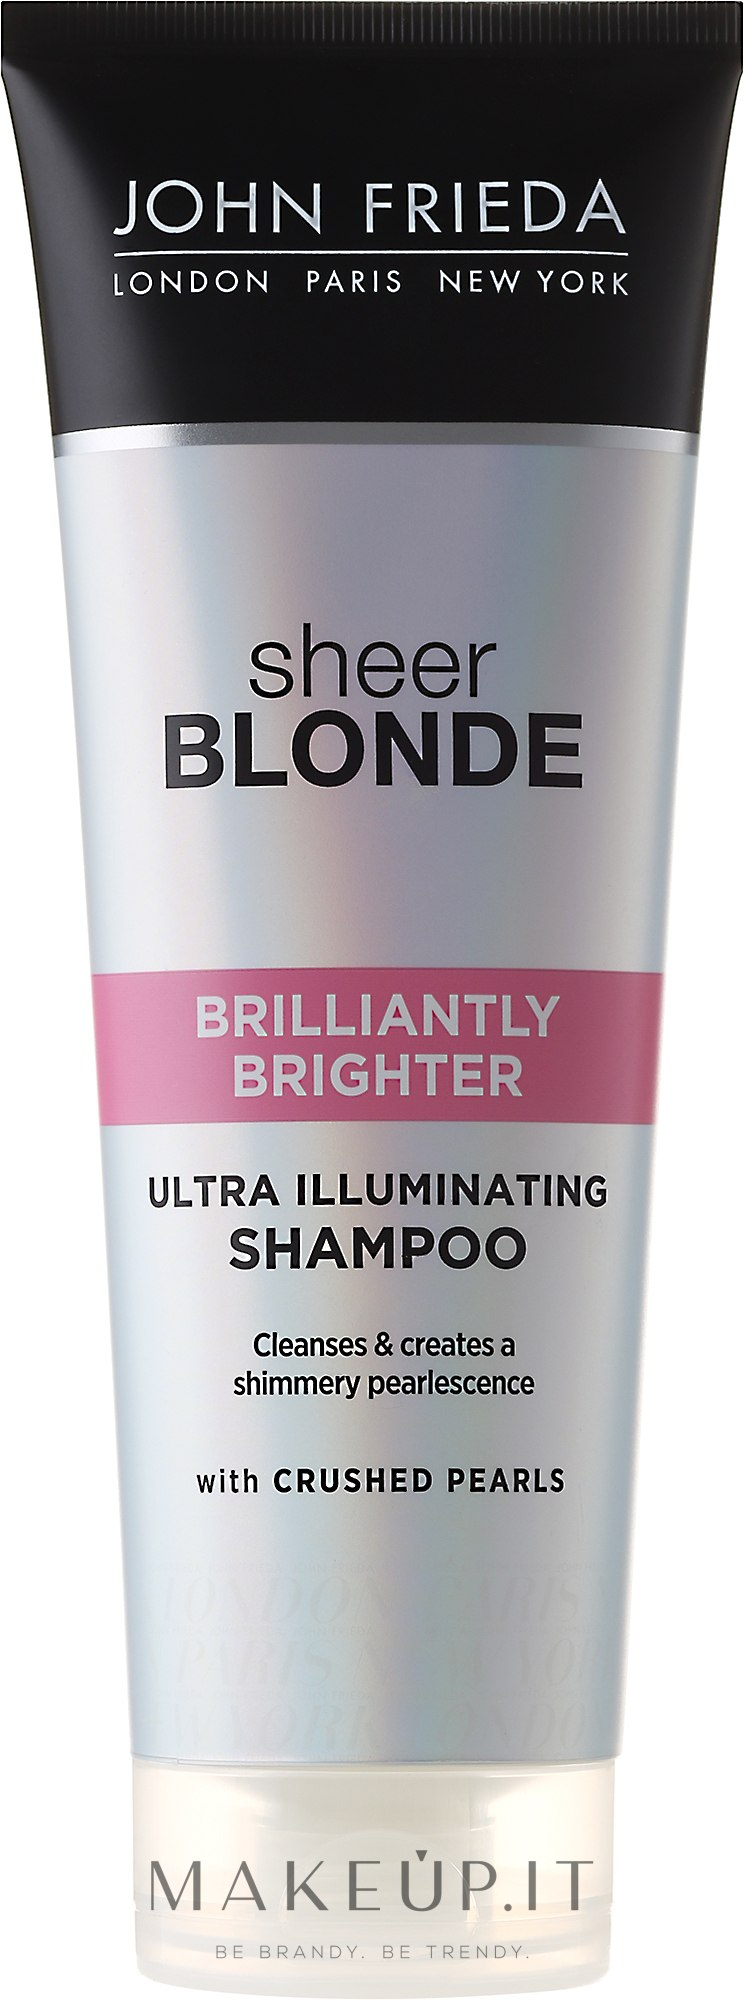 Shampoo per lucidare capelli biondi - John Frieda Sheer Blonde Brilliantly Brighter Shampoo — foto 250 ml